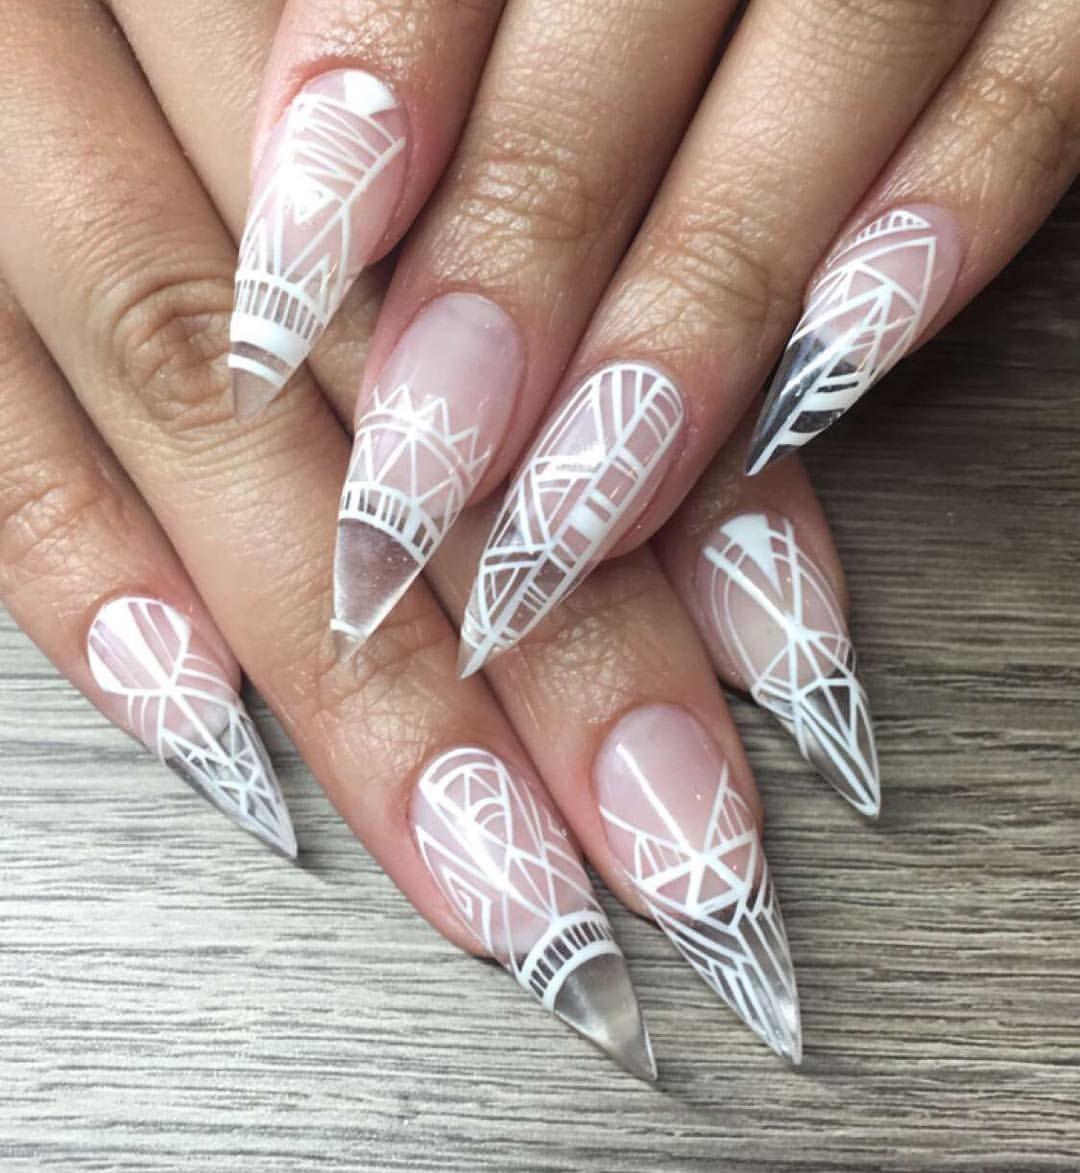 White, negative space, clear stilettos | Nail Art | Pinterest ...